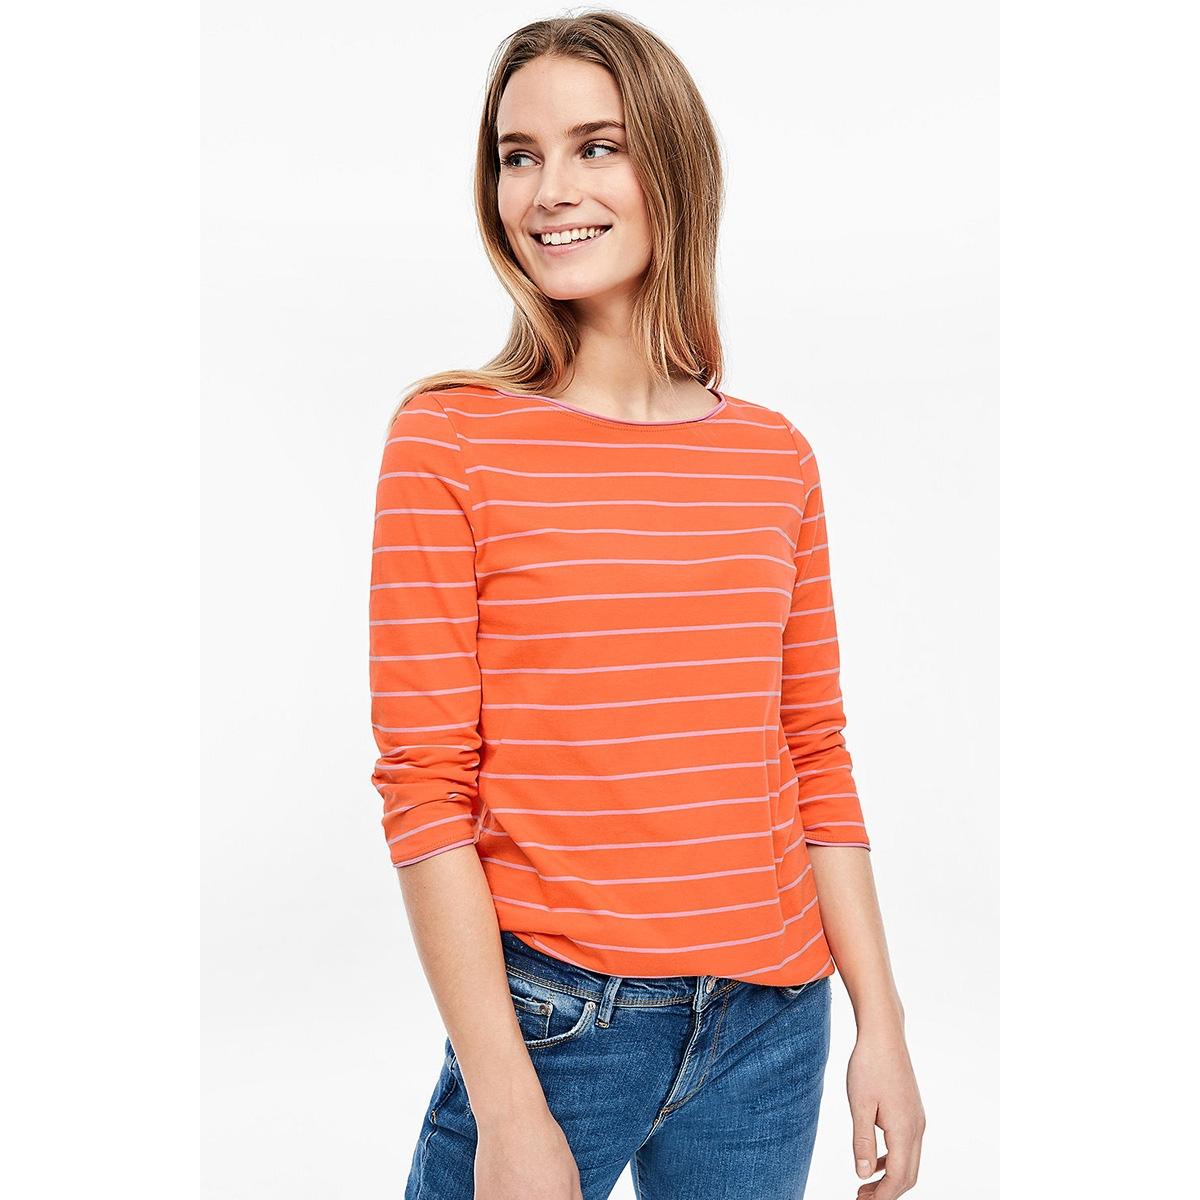 t shirt met streeppatroon 14001395949 s.oliver t-shirt 23g4